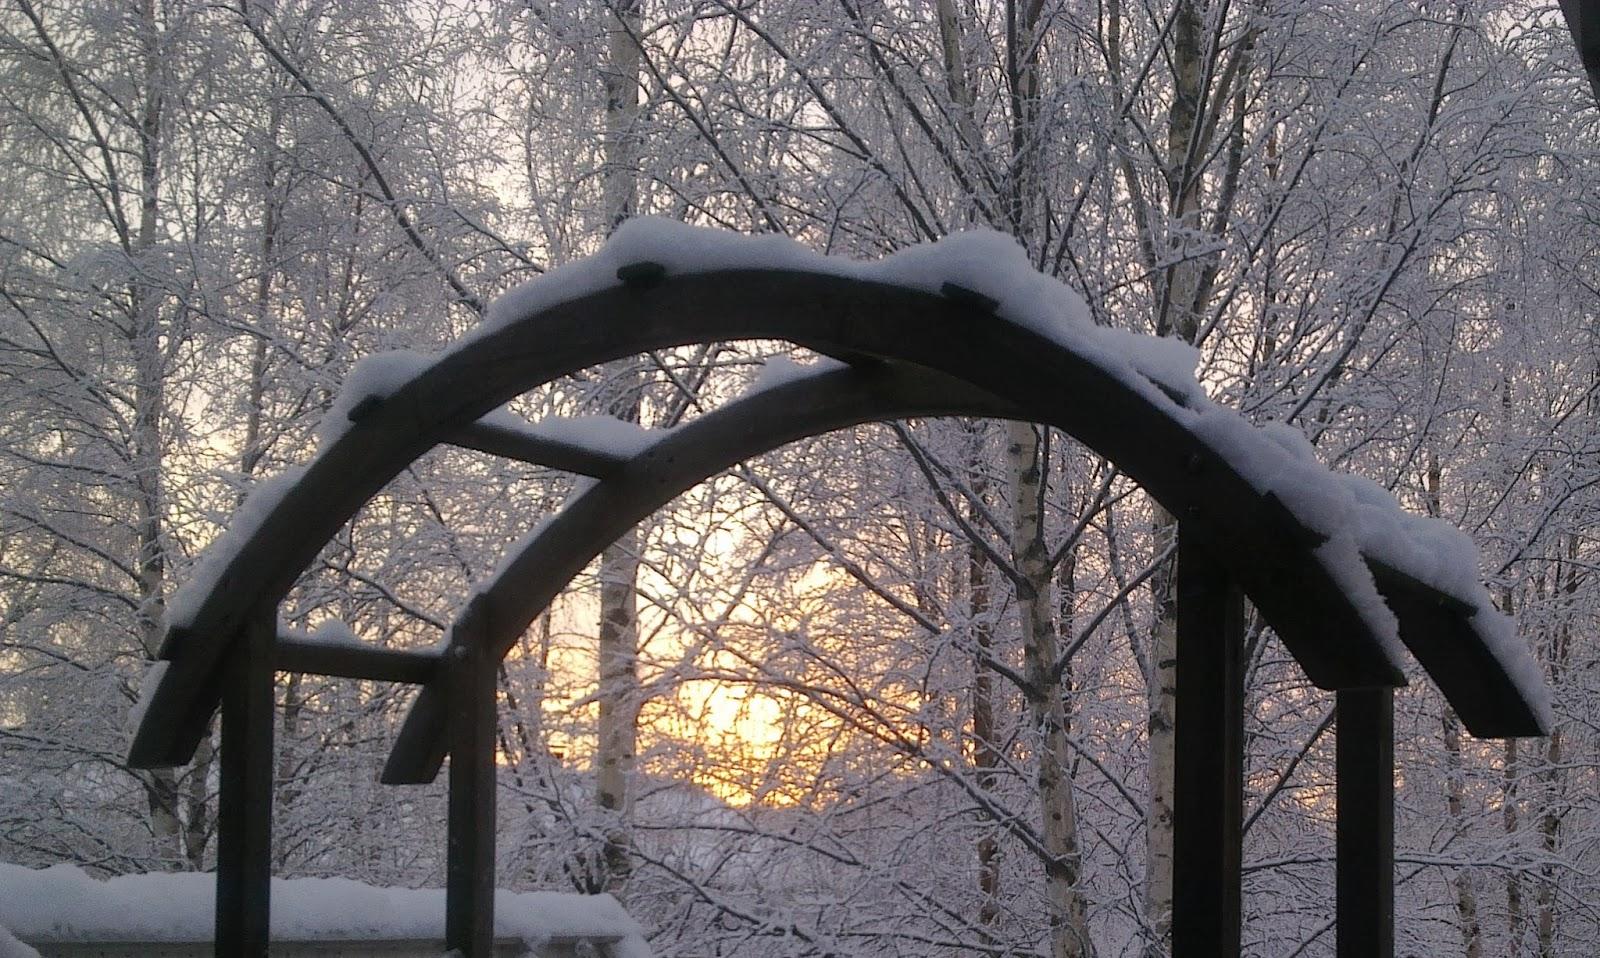 kaariportti, talvi, tammikuu, aurinko